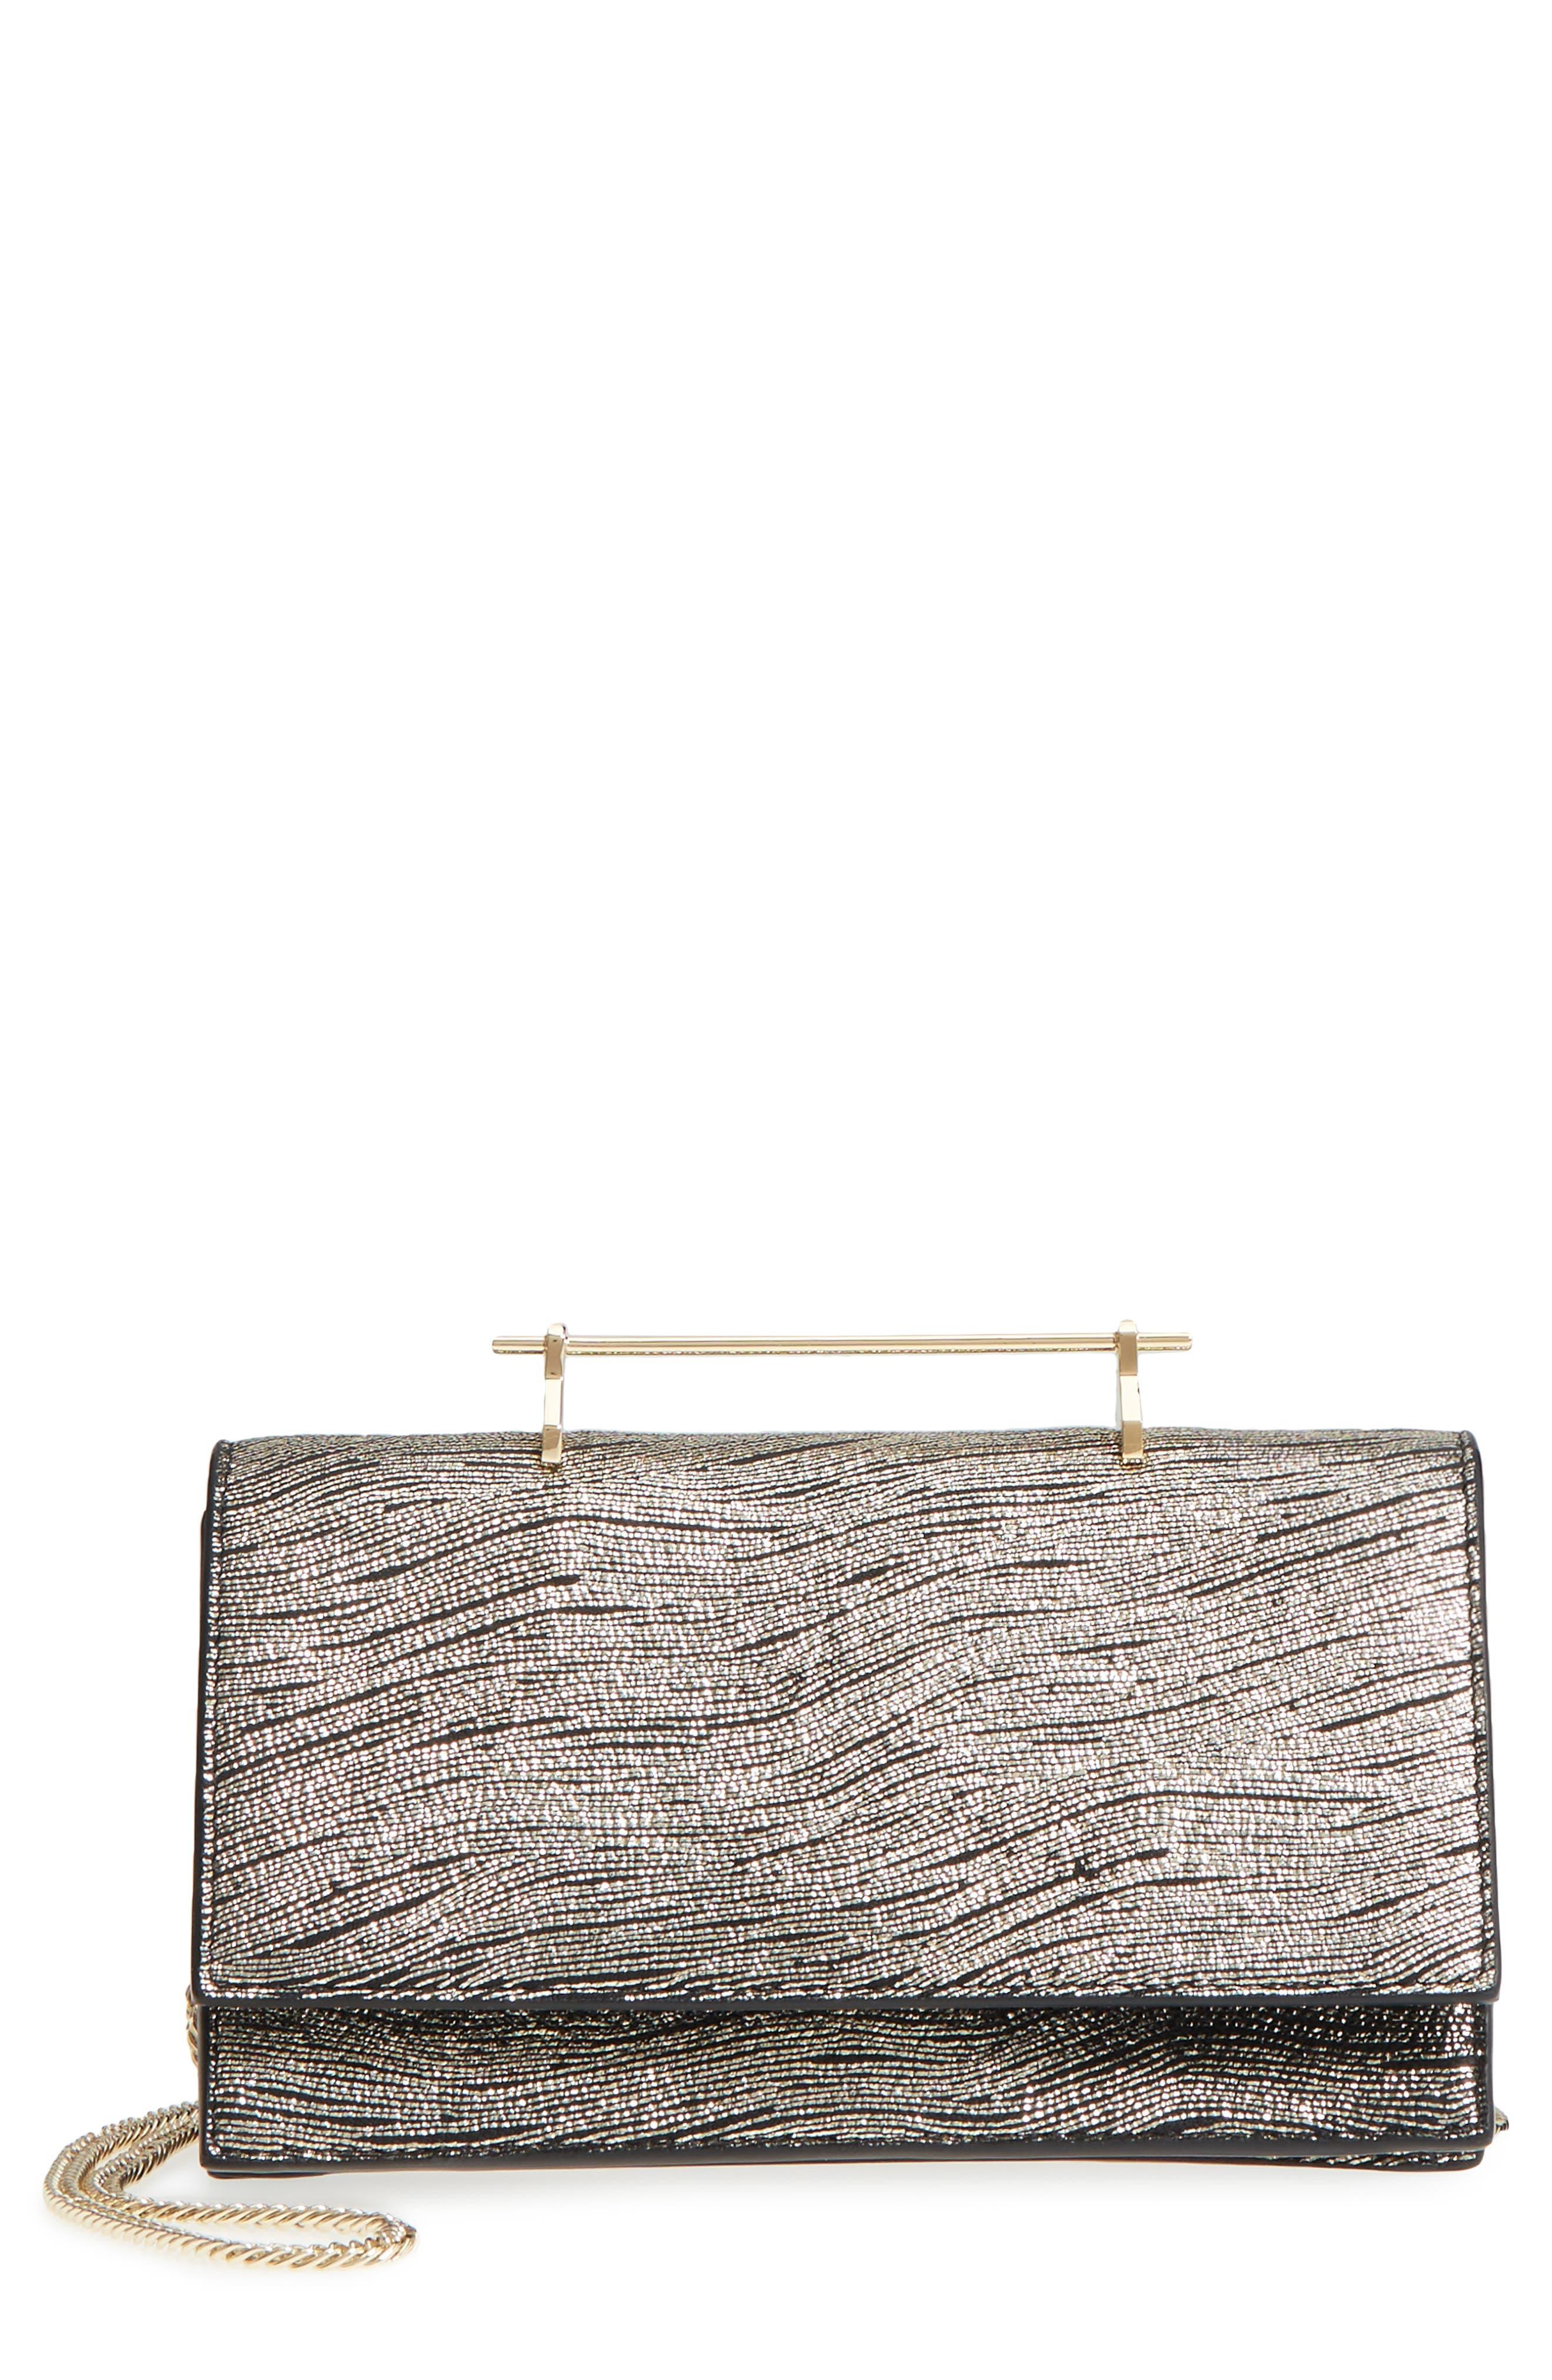 Main Image - M2Malletier Alexia Metallic Calfskin Leather Clutch